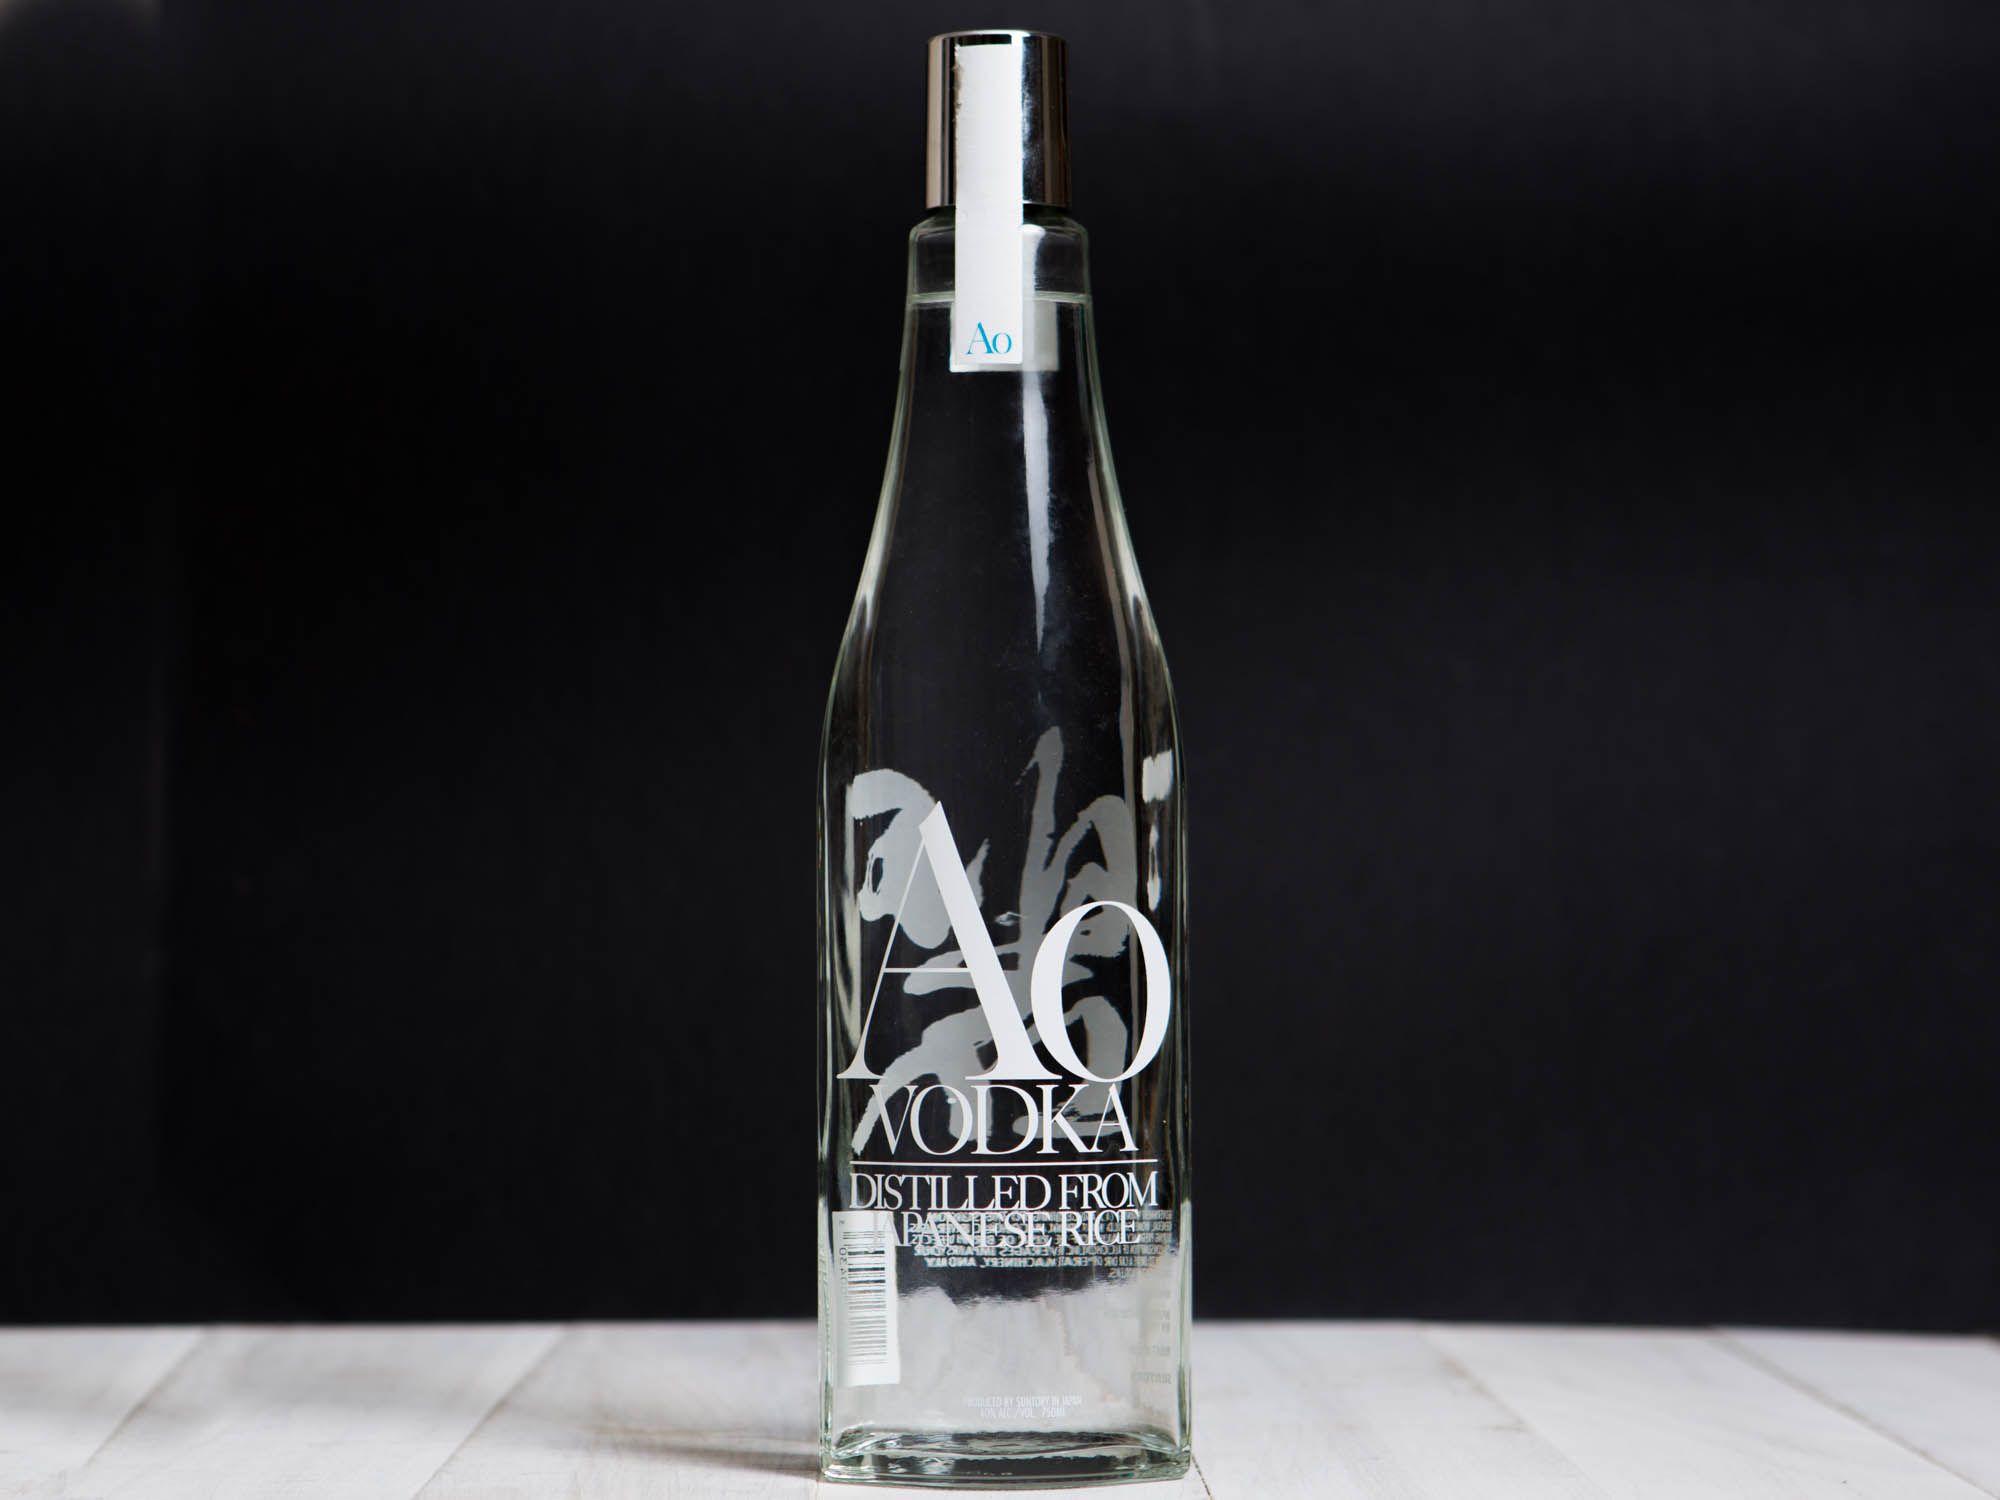 20150714-vodka-ao-vicky-wasik-1.jpg